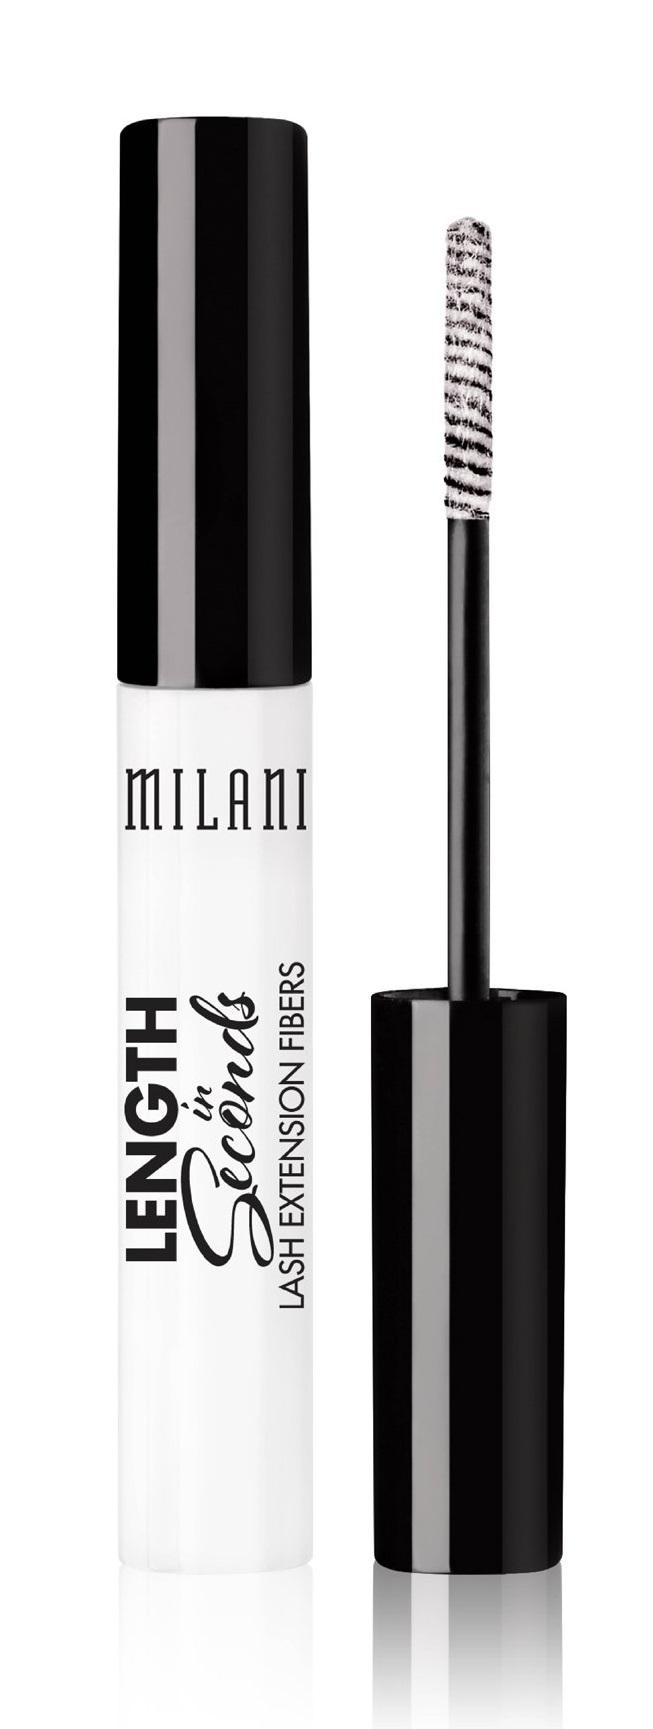 Milani Length In Seconds Lash Extension Fibers